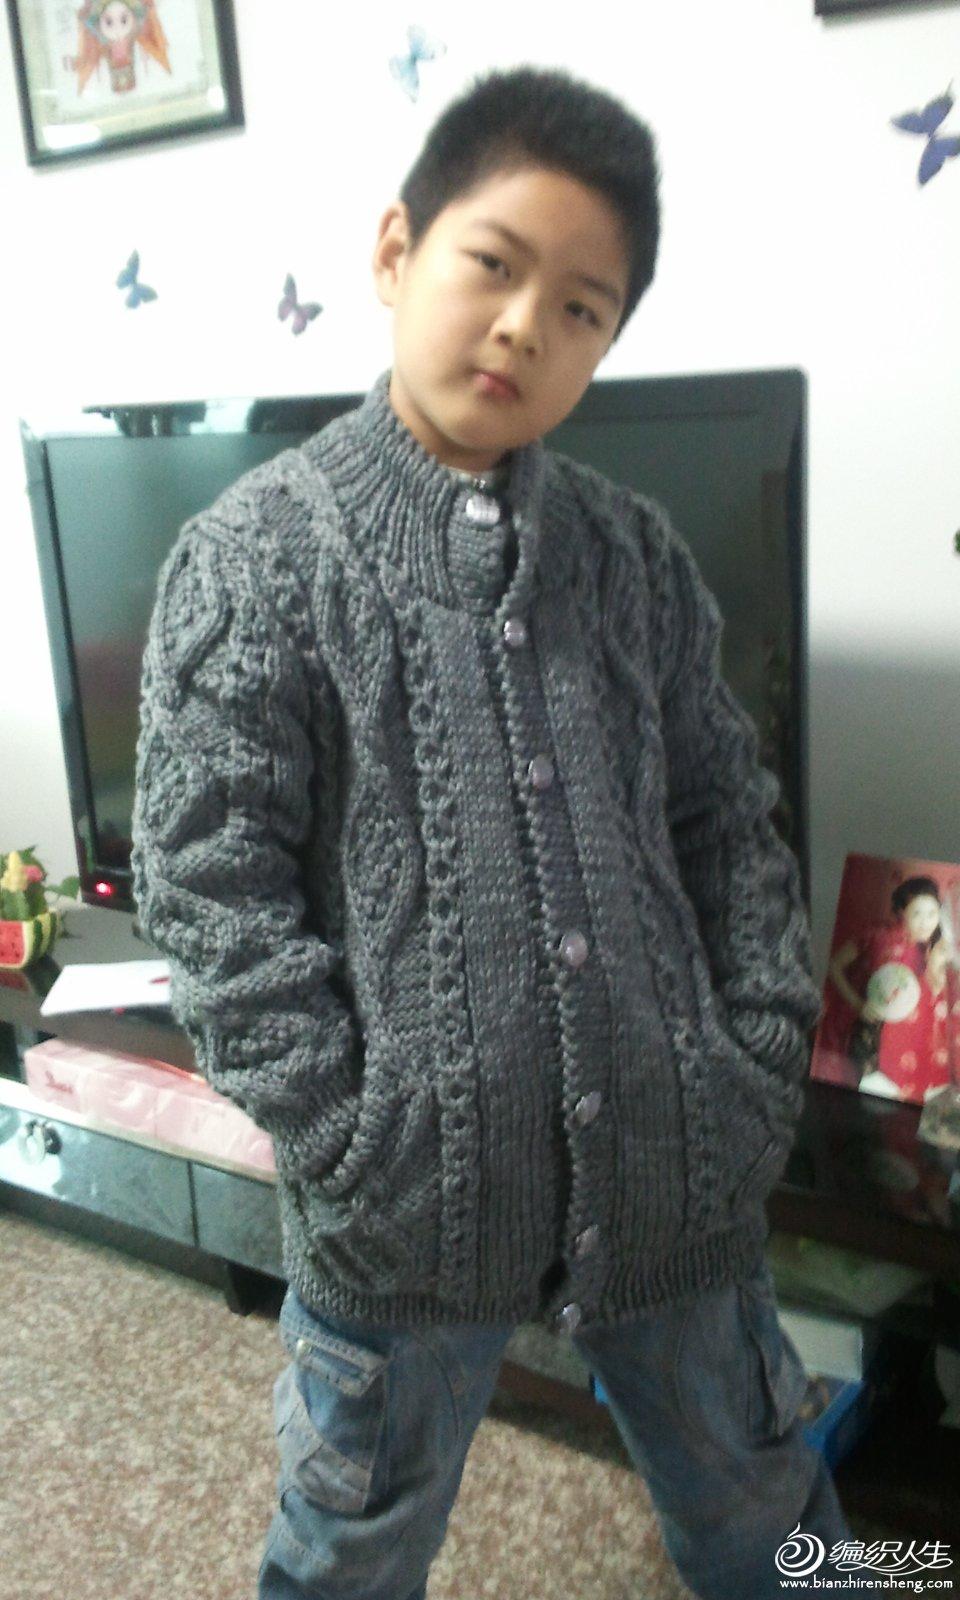 C360_2012-12-01-10-25-00.jpg